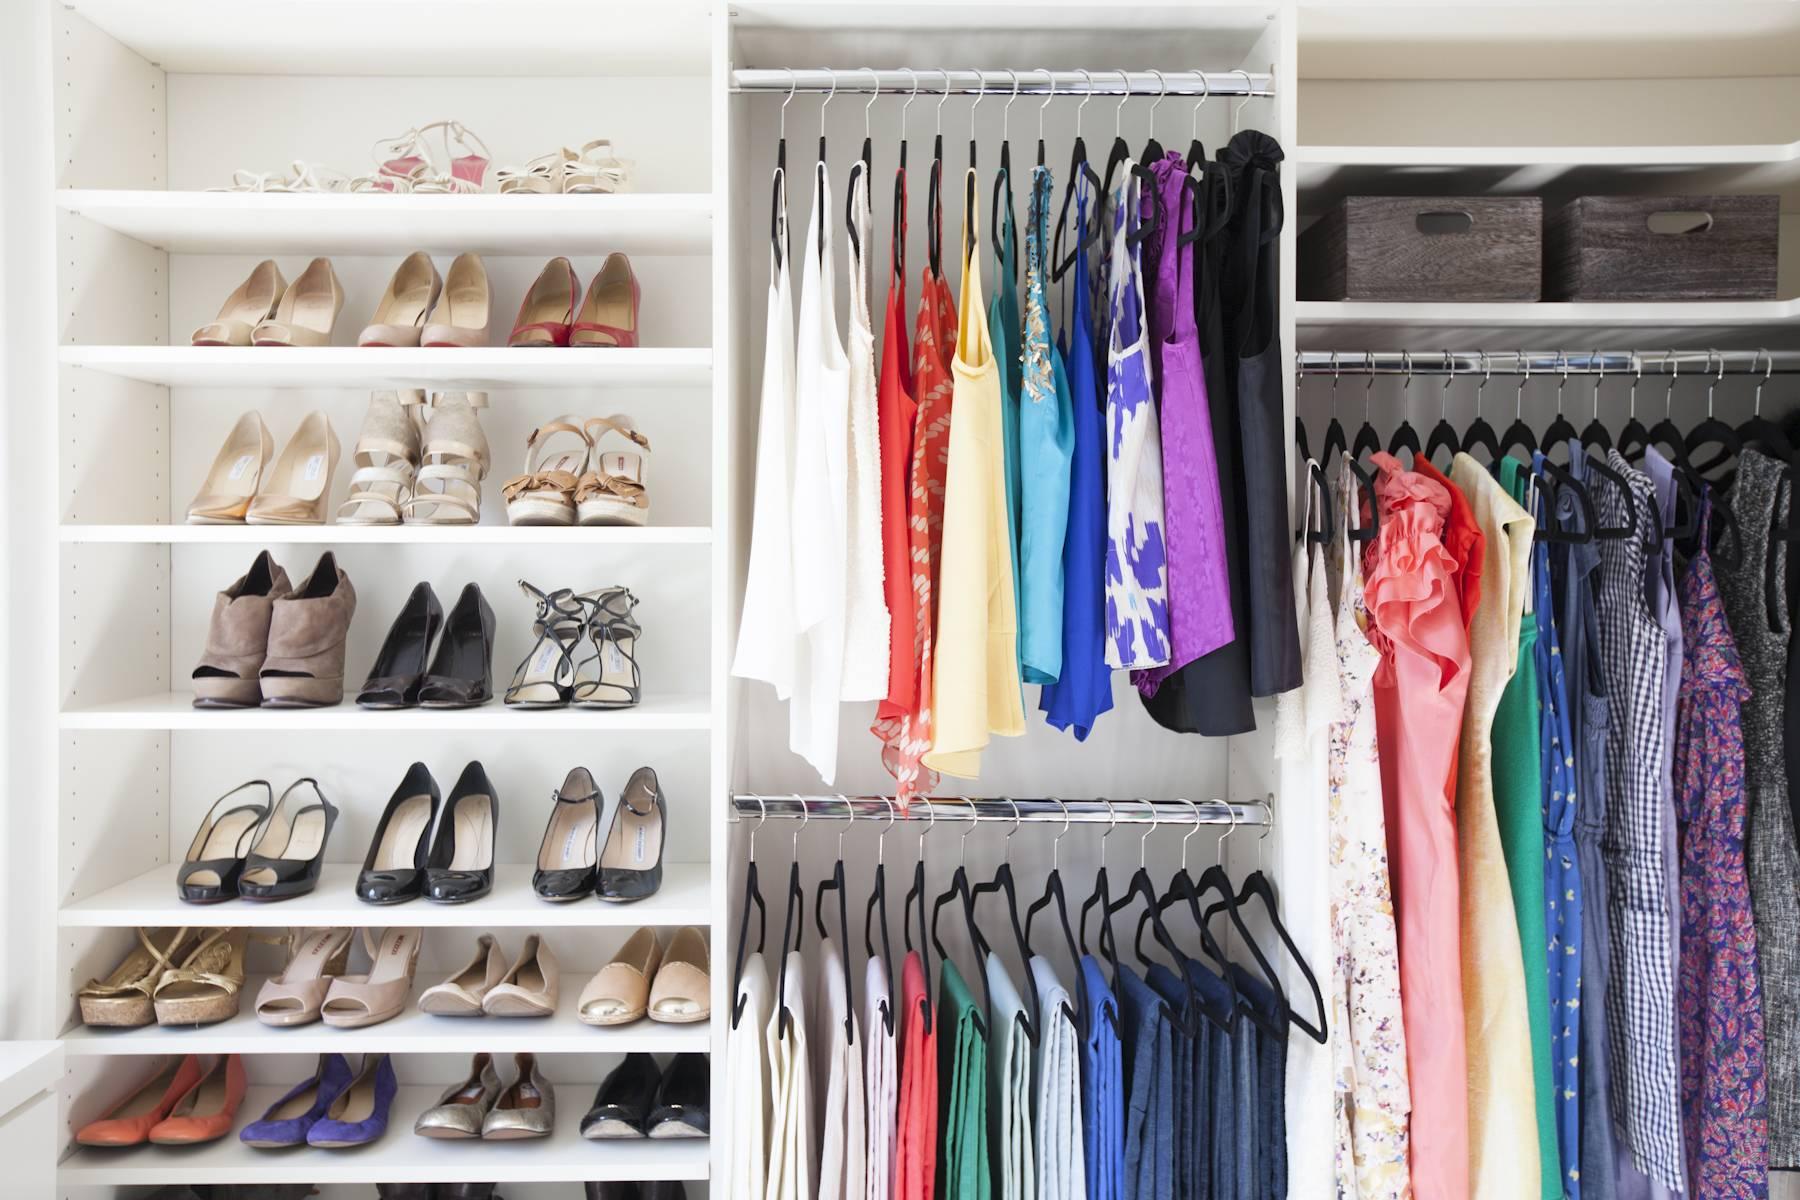 Tips to organize your wardrobe